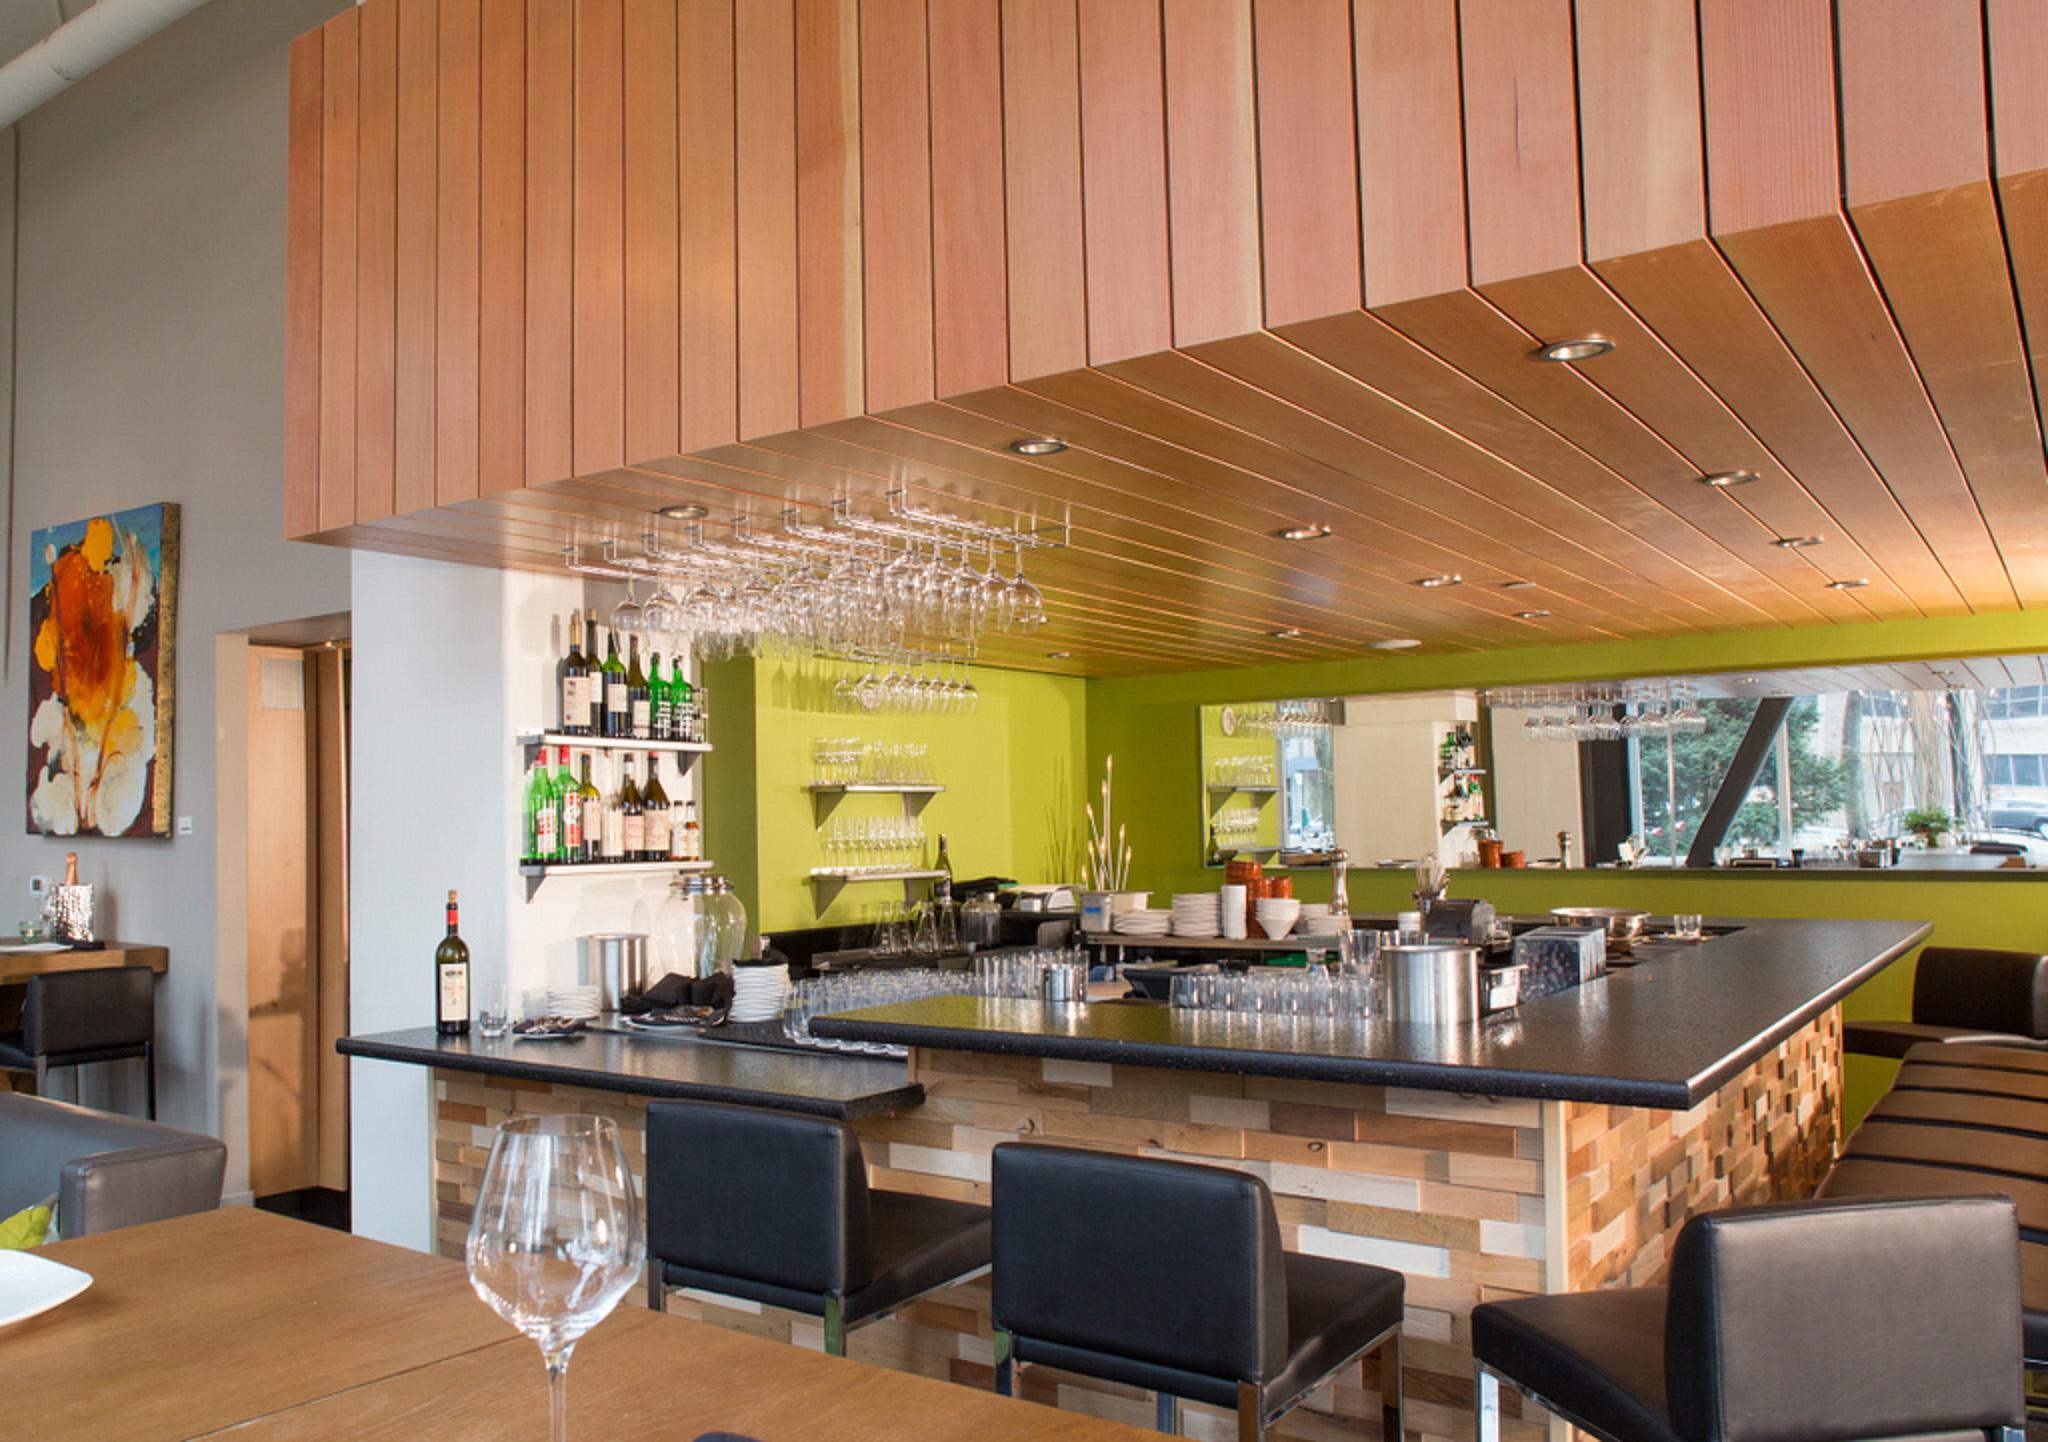 Lord Interior Design - North Park Blocks-14.jpg